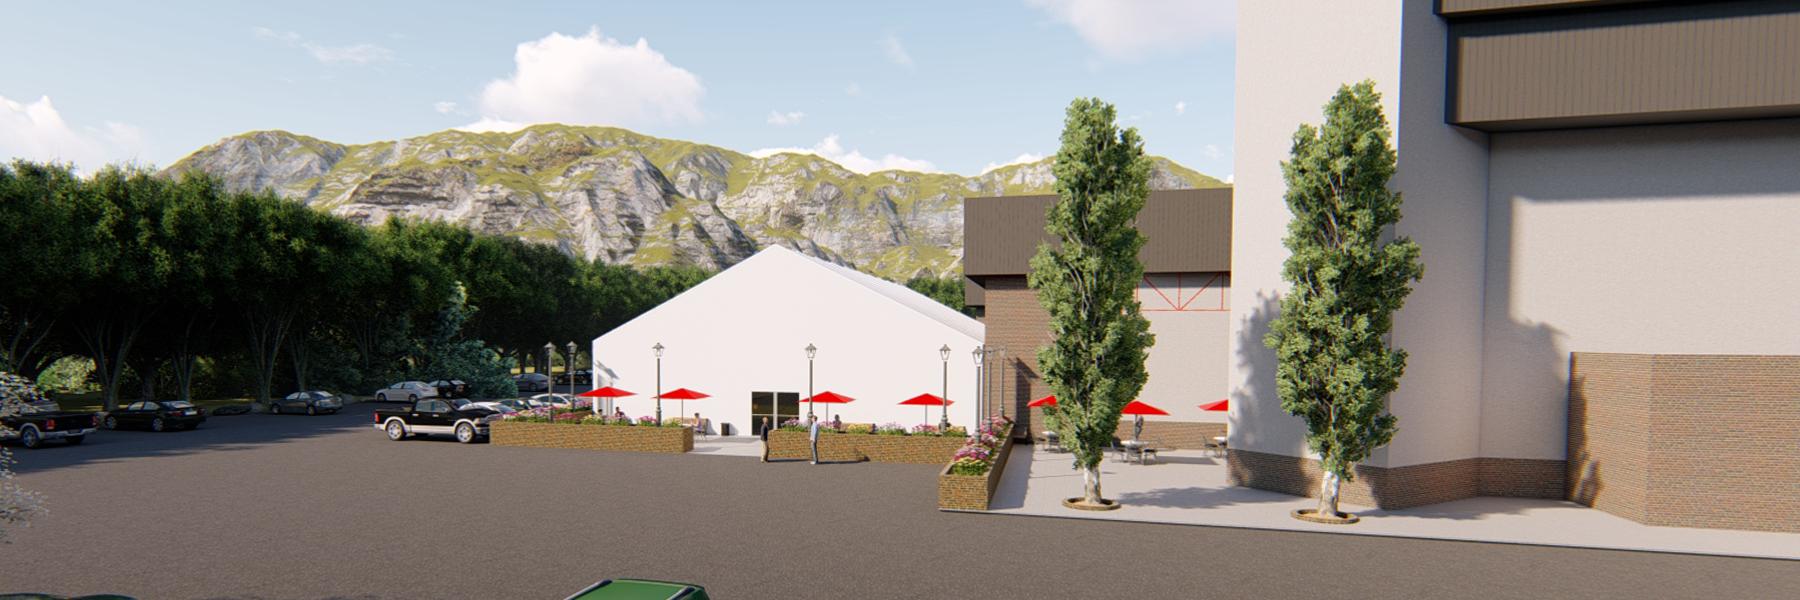 Outdoor Lunch Building for Social Distancing 3D Rendering